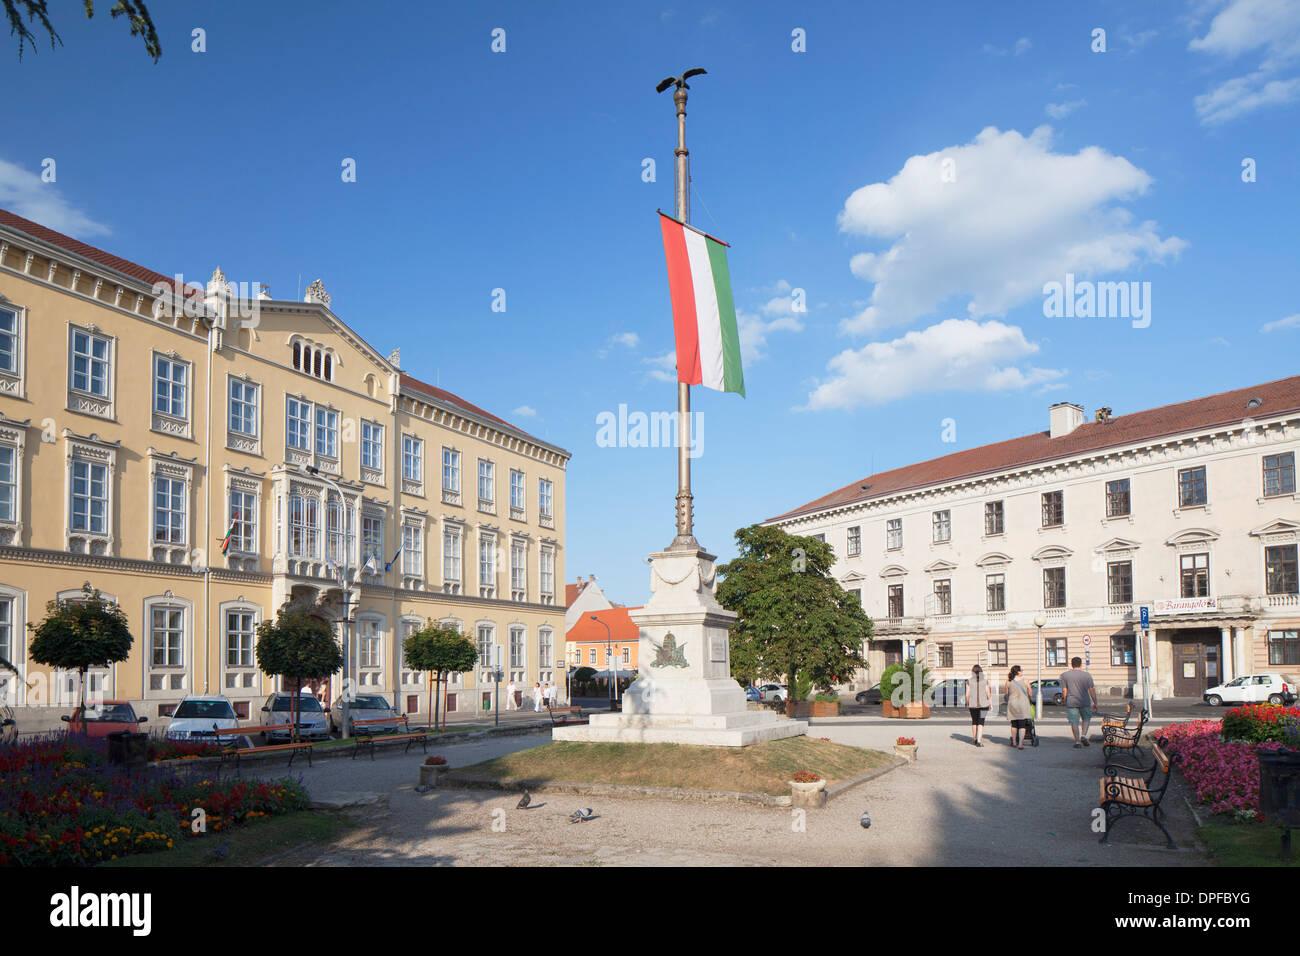 Flag of Loyalty in Szechenyi Square, Sopron, Western Transdanubia, Hungary, Europe - Stock Image